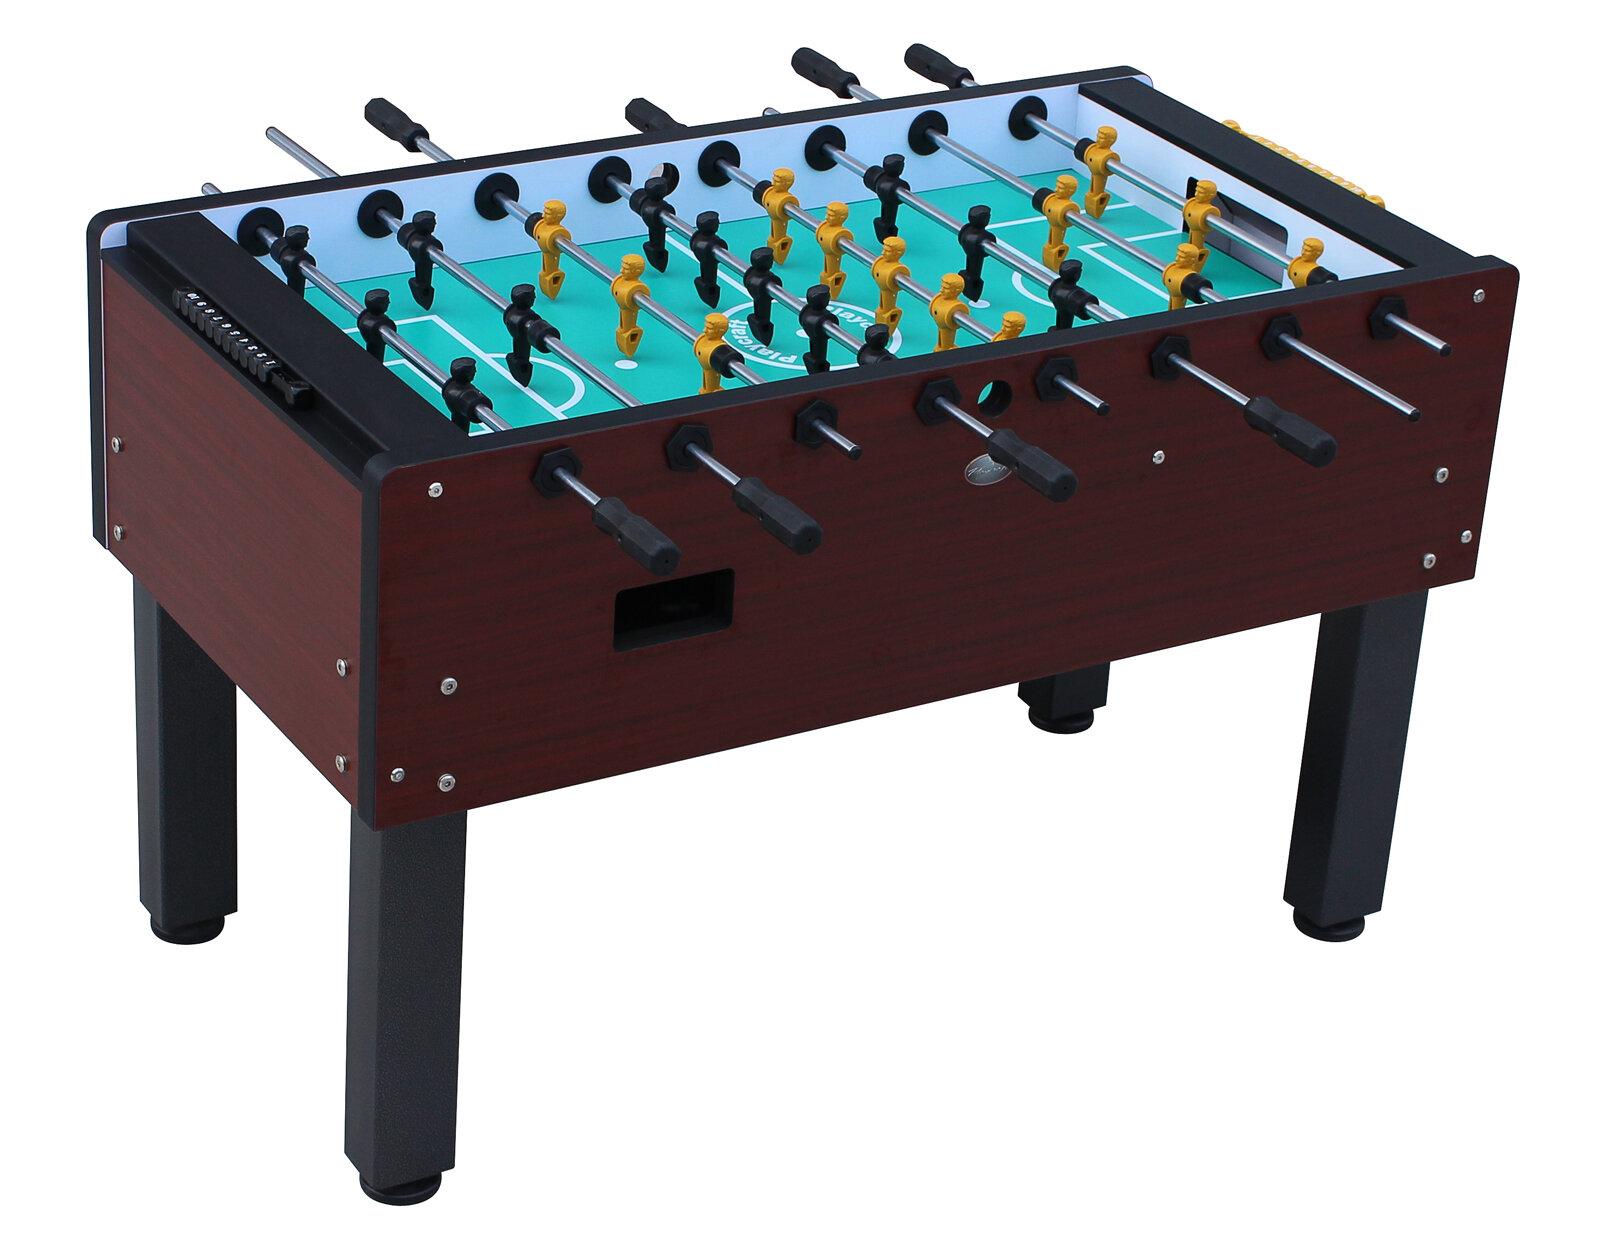 Playcraft Tournament Foosball Table Wayfair - Tournament soccer foosball table